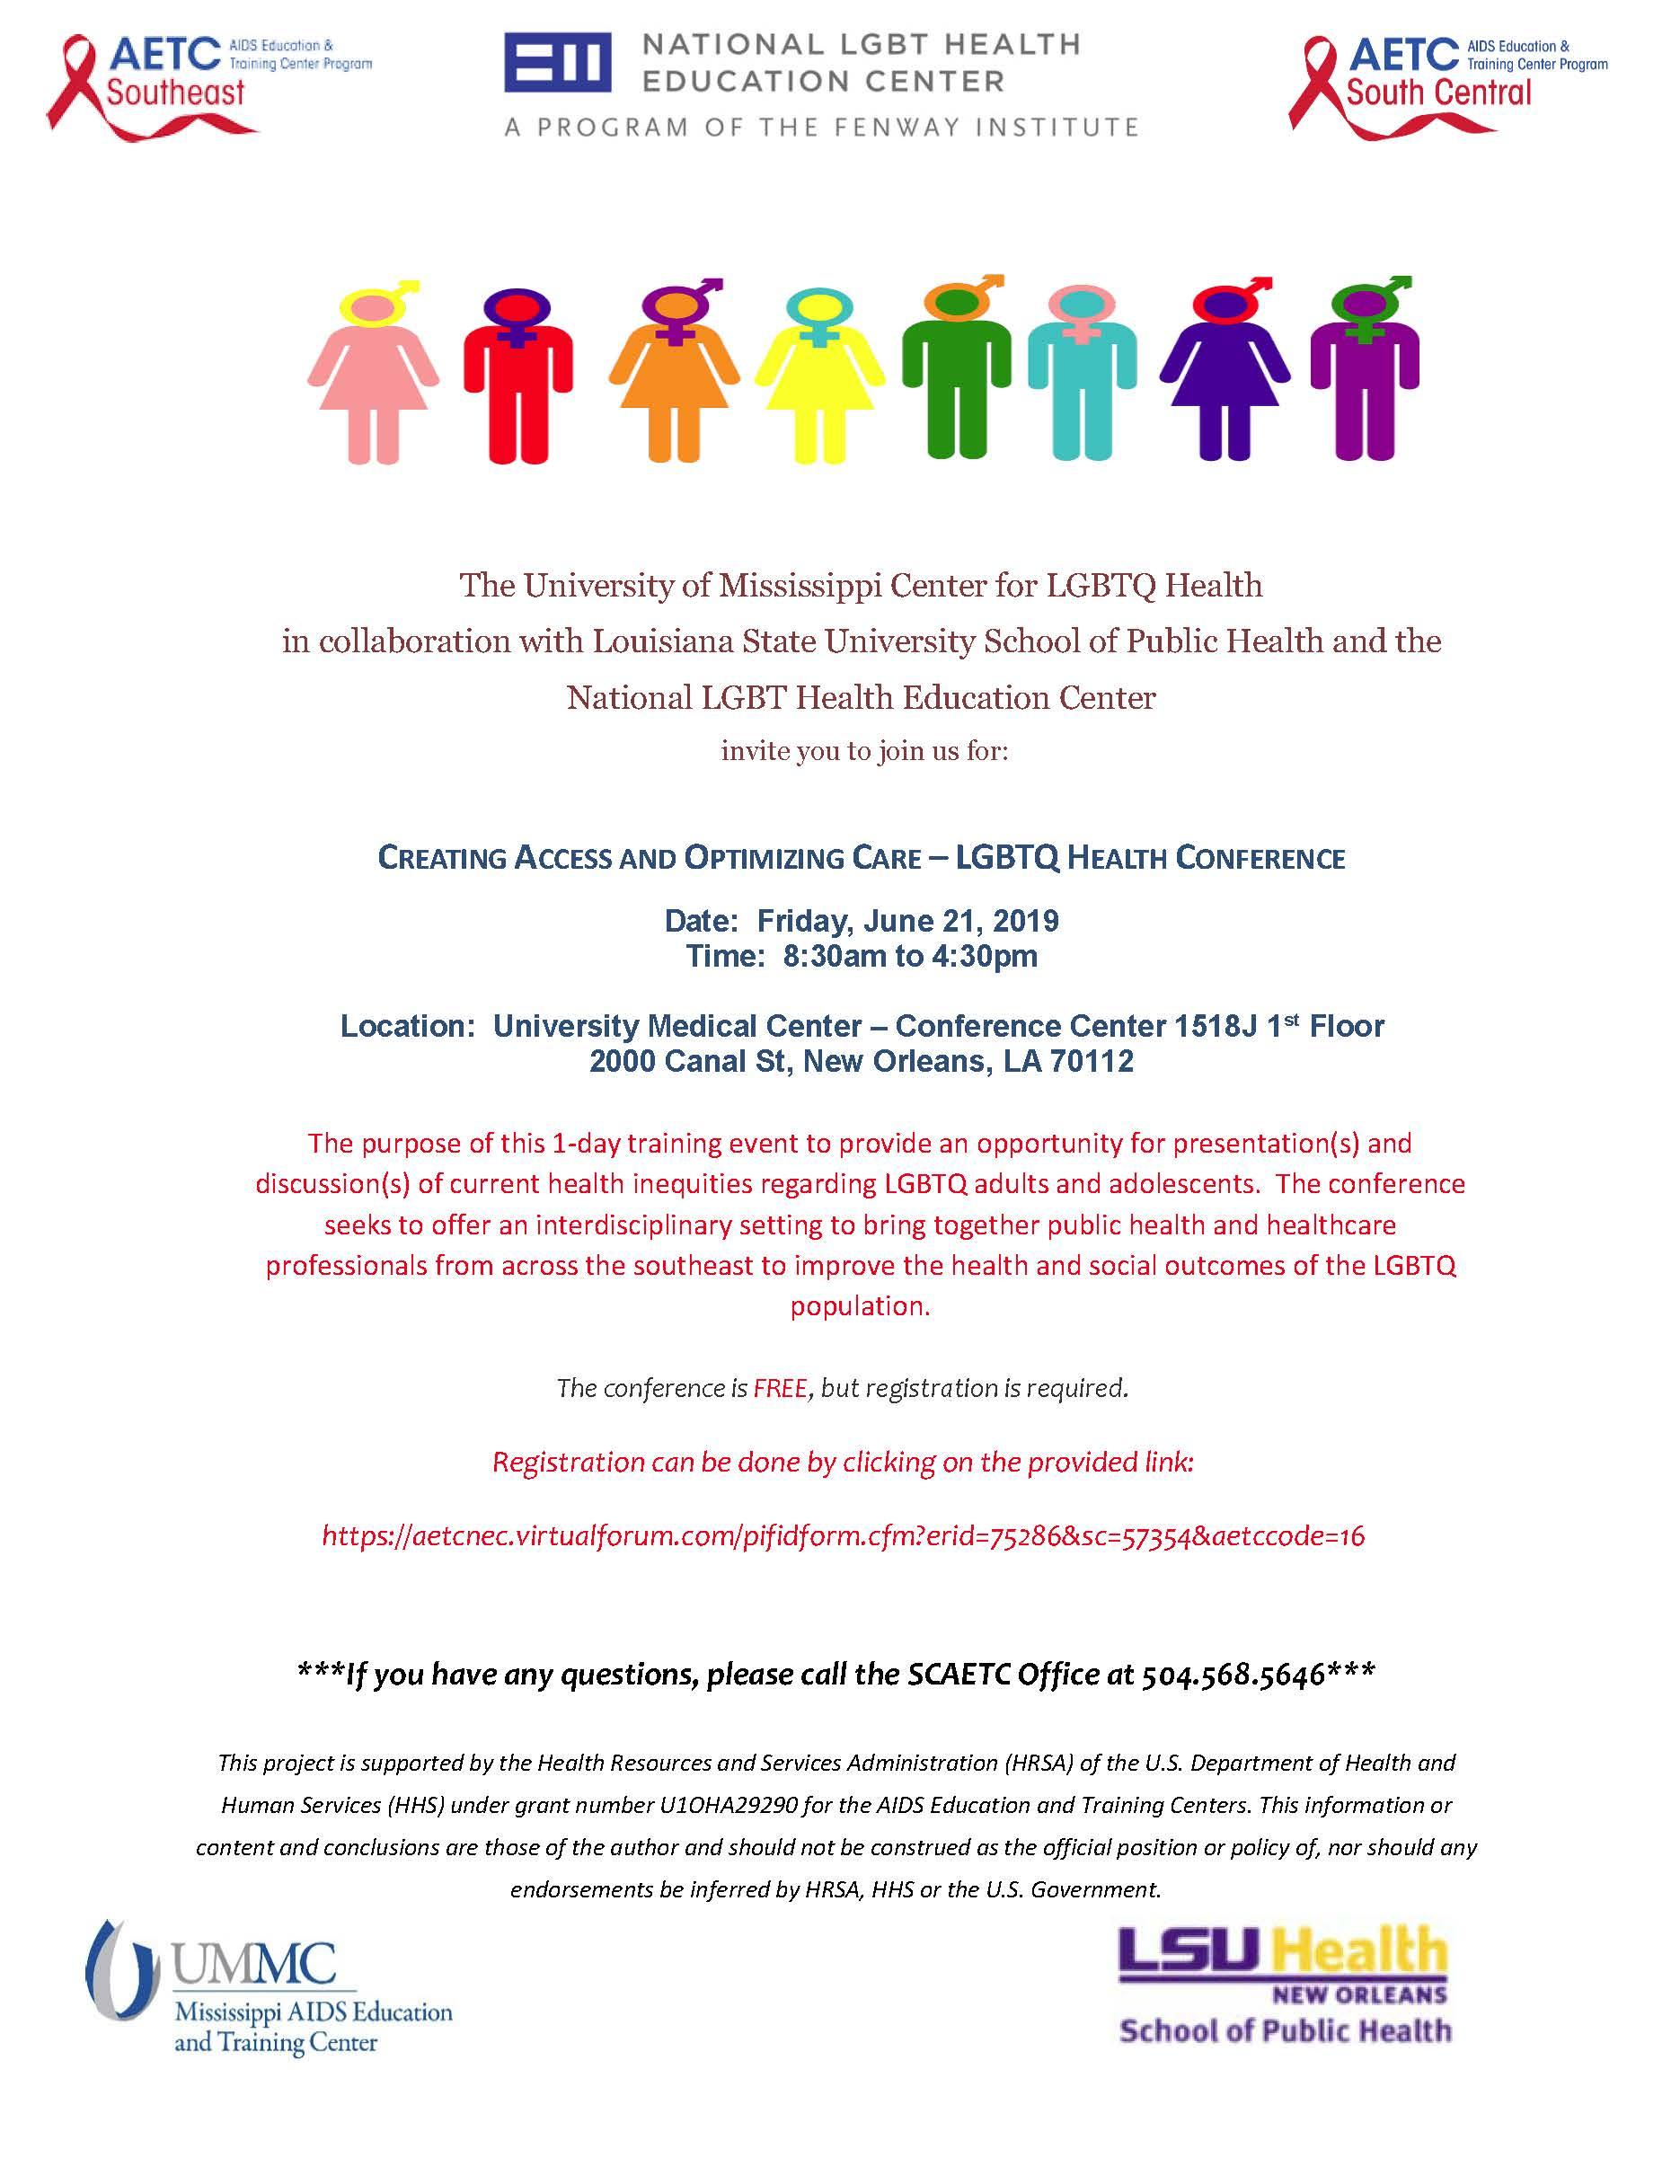 LGBTQ conference.jpg